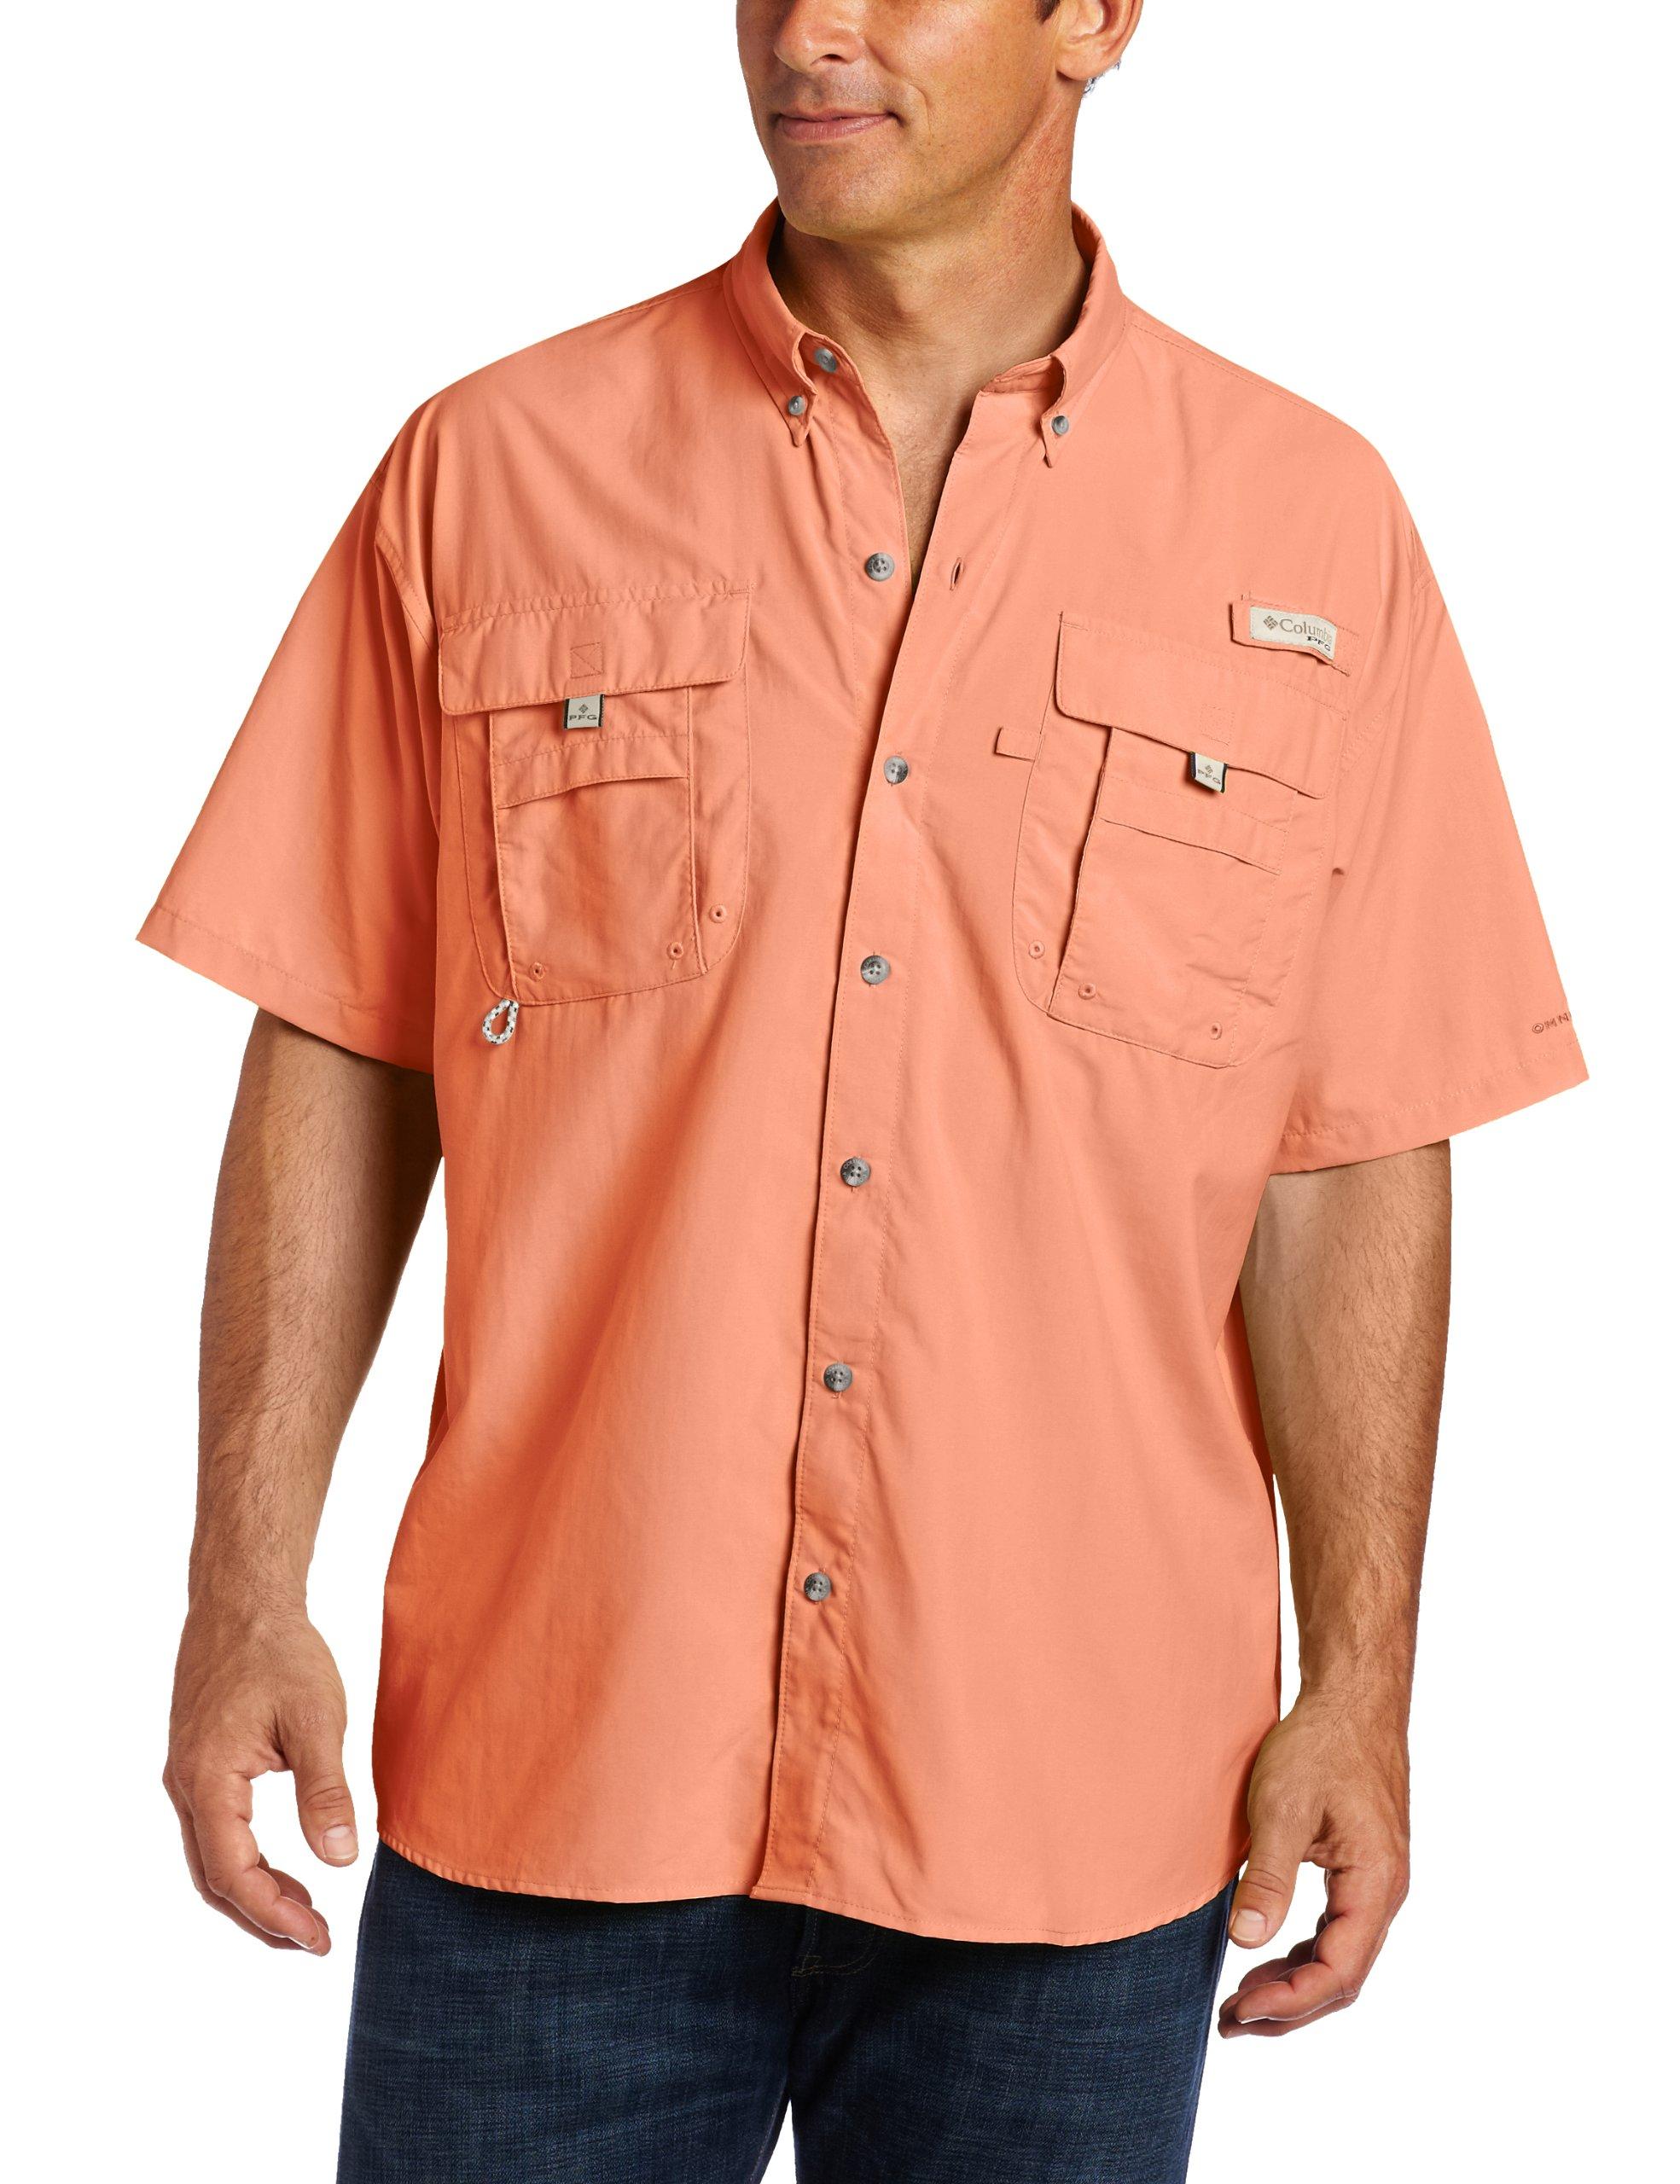 Columbia Men's PFG Bahama II Short Sleeve Shirt, Bright Peach, X-Small